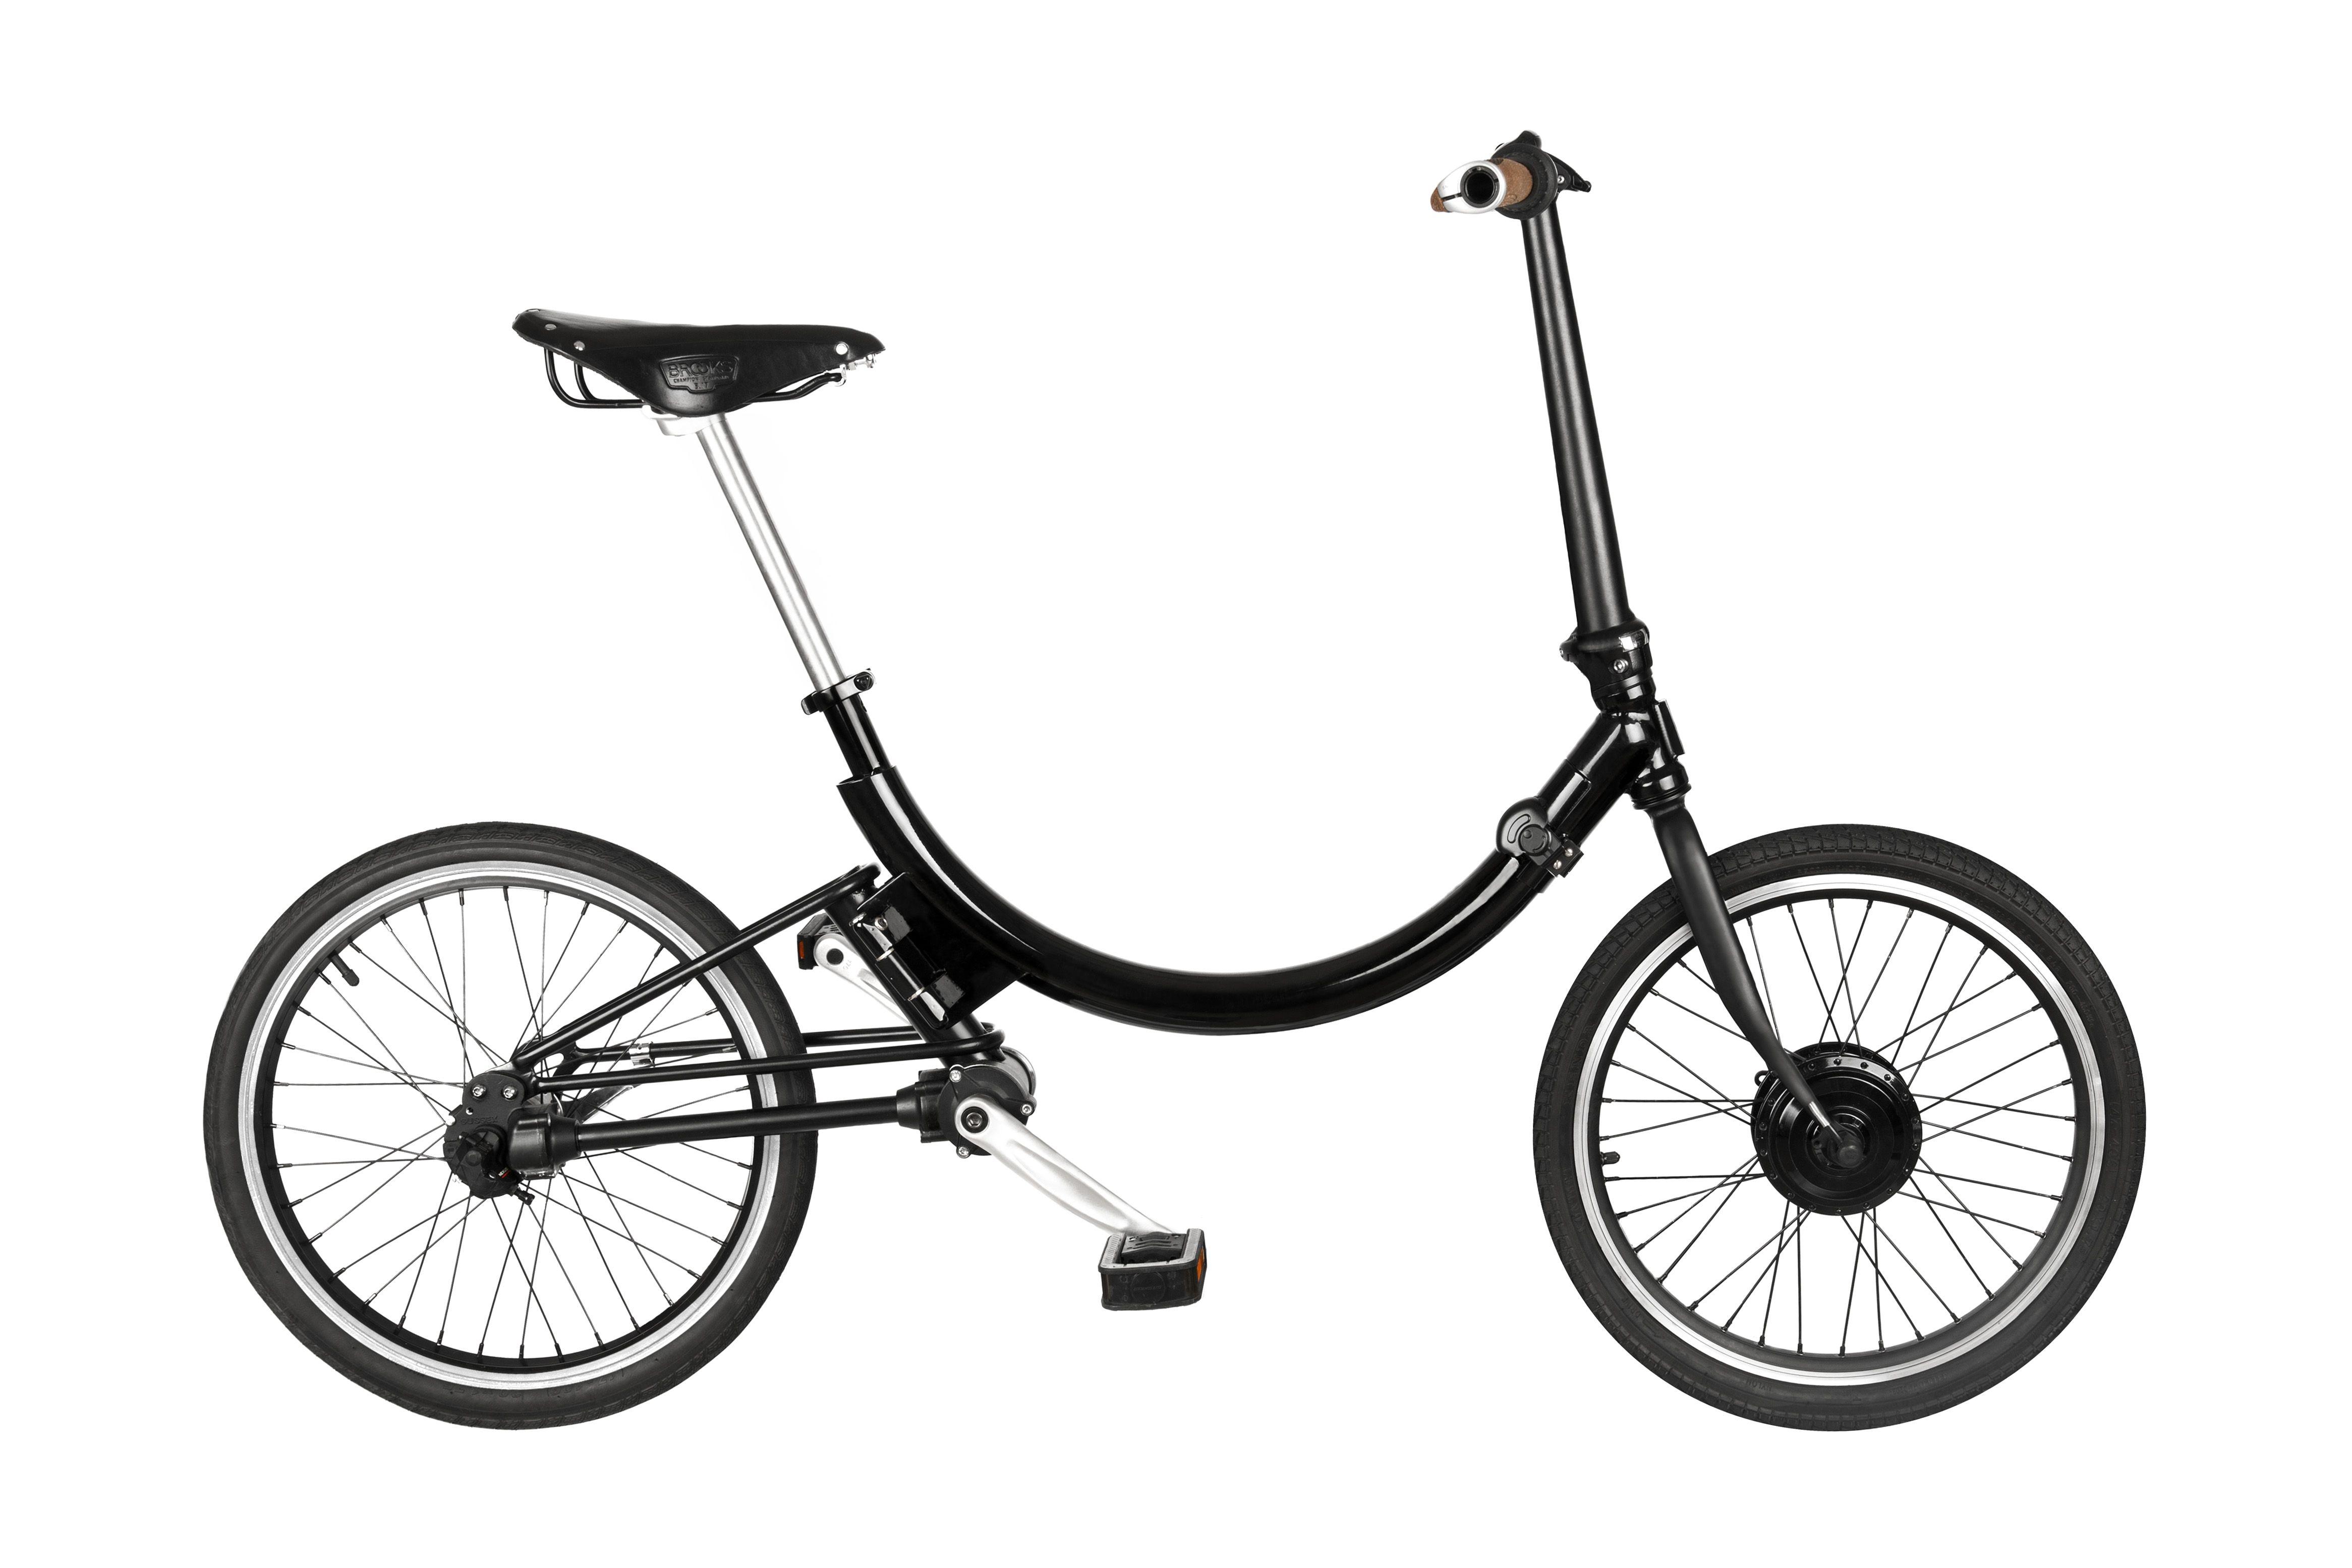 Foldingbike Bike Parts Pinterest Bicycling